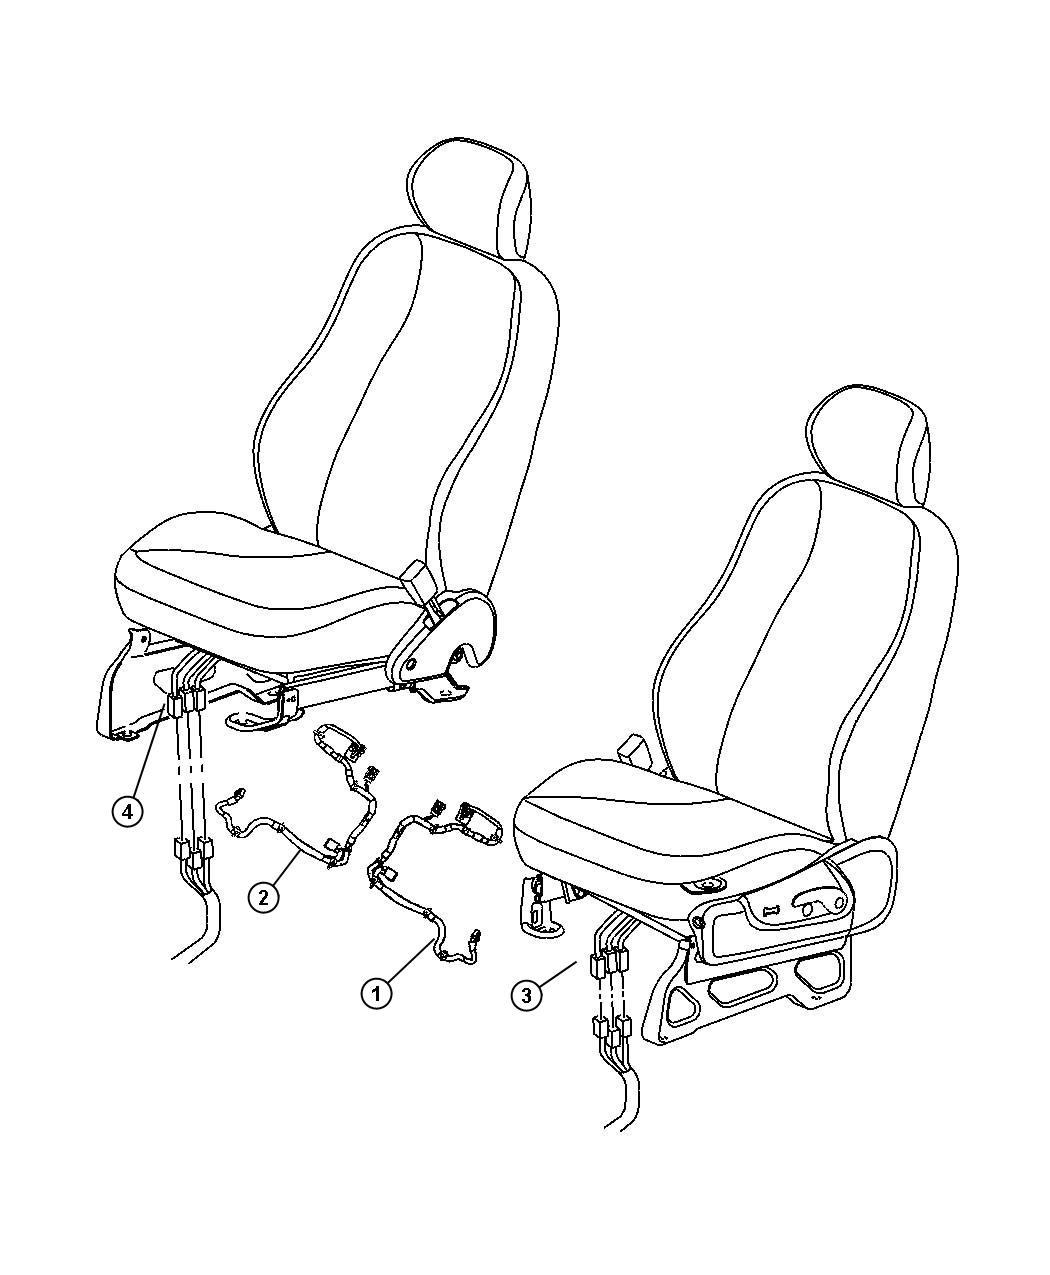 Dodge Nitro Wiring. Heated seat. Right. Export. Trim